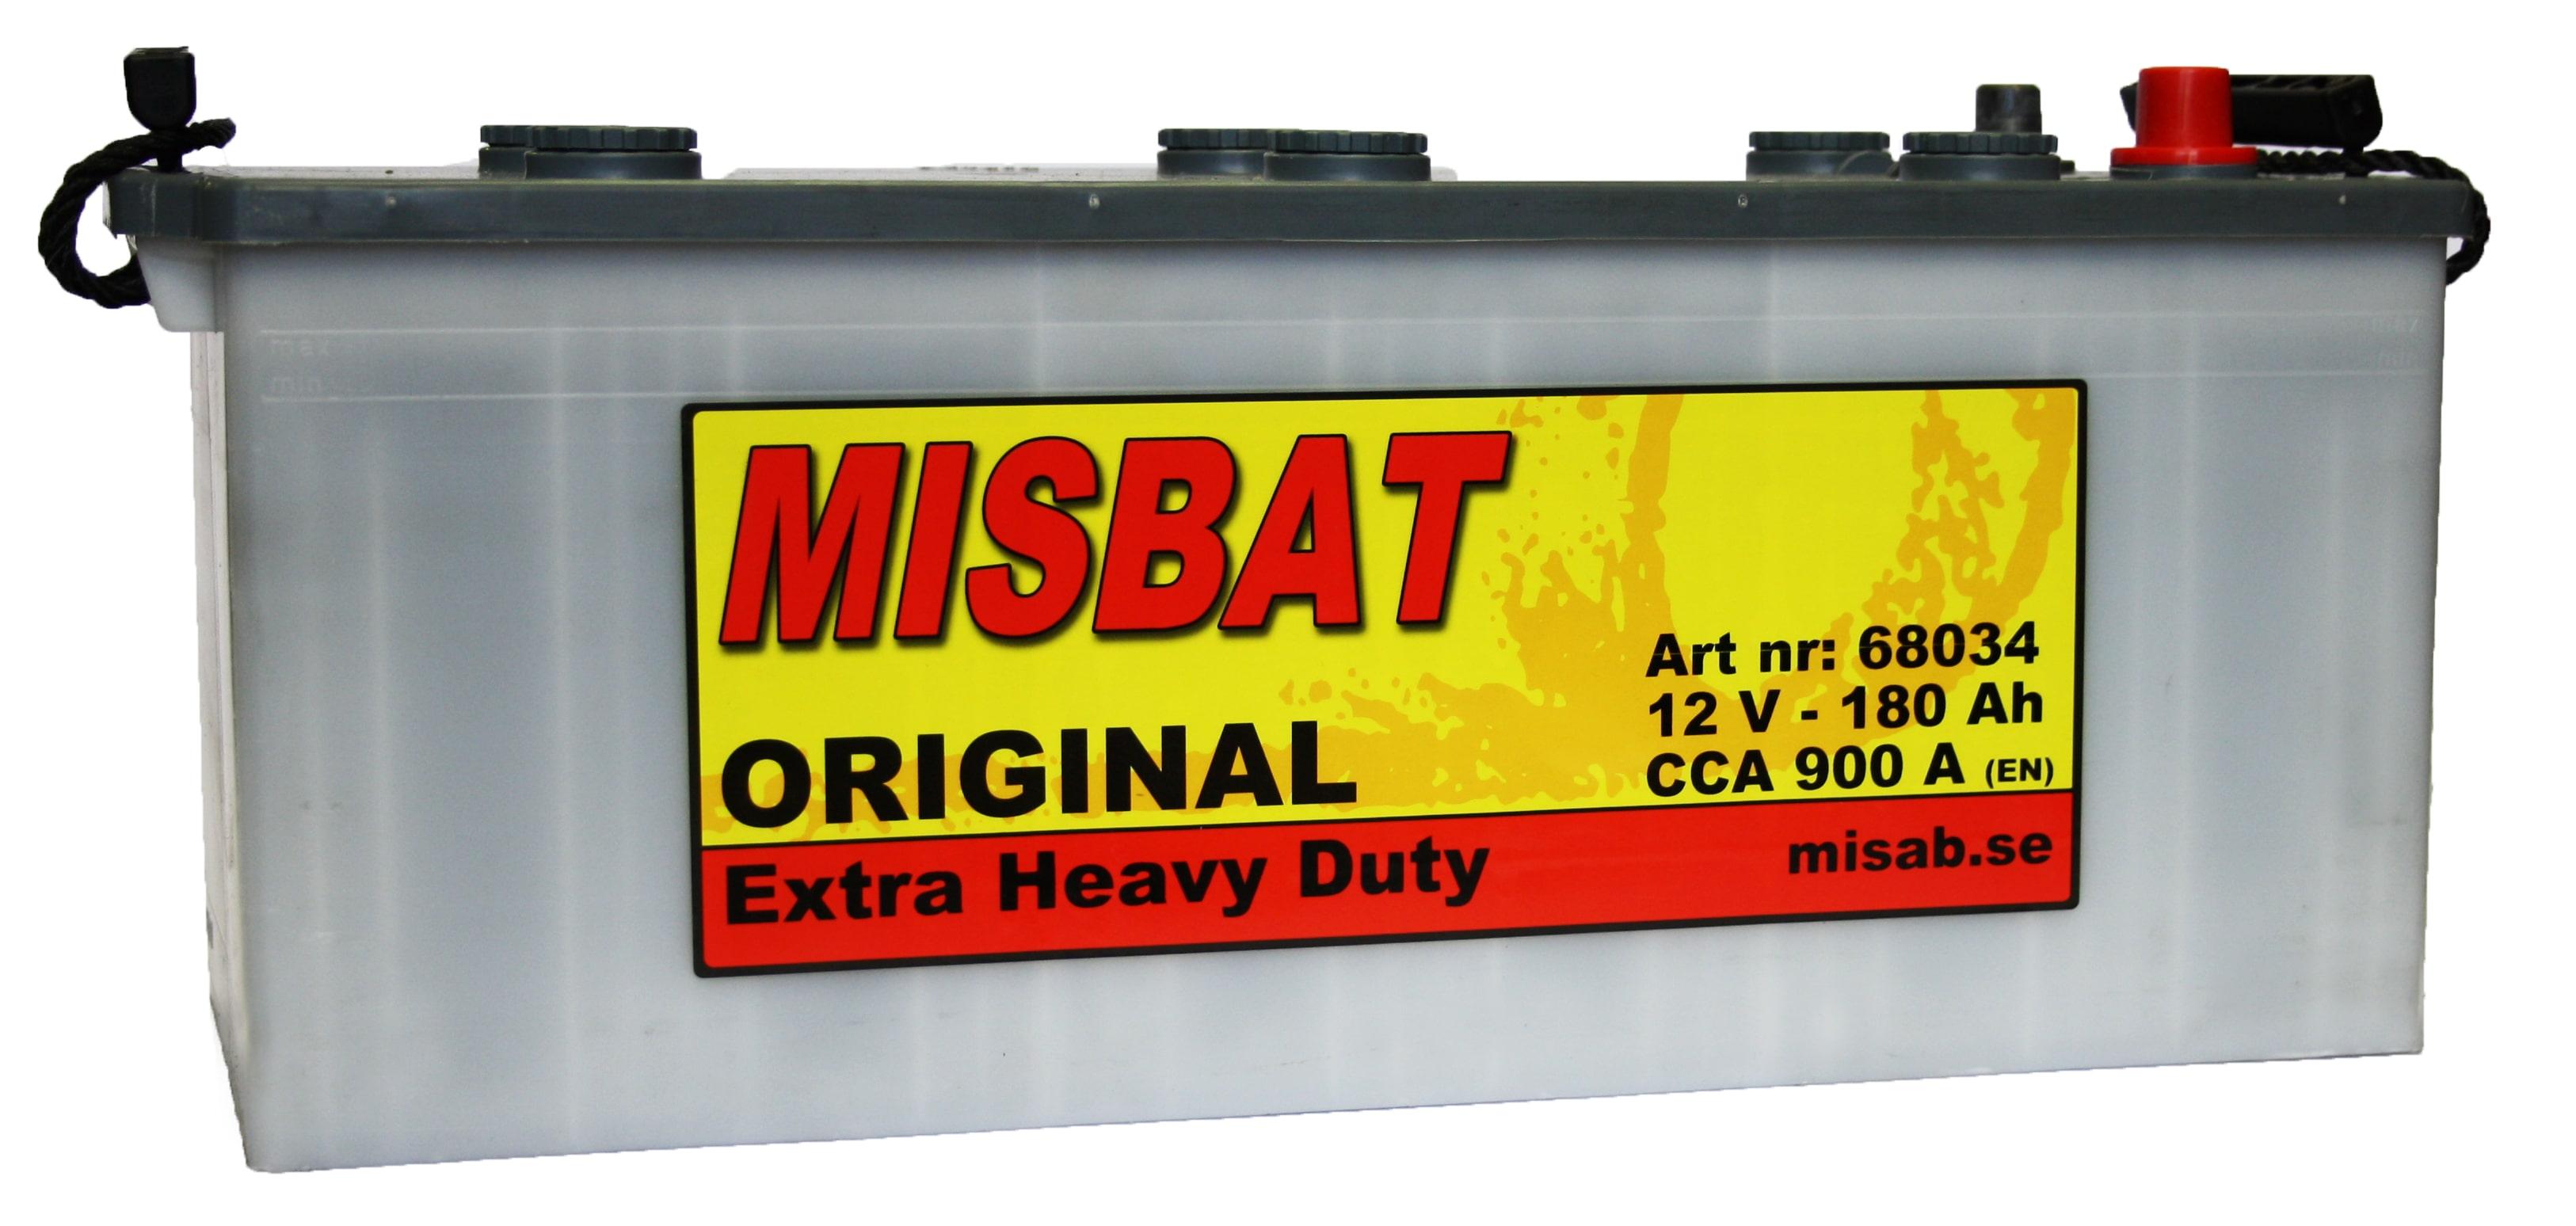 MISBAT ORIGINAL EHD 180 AH